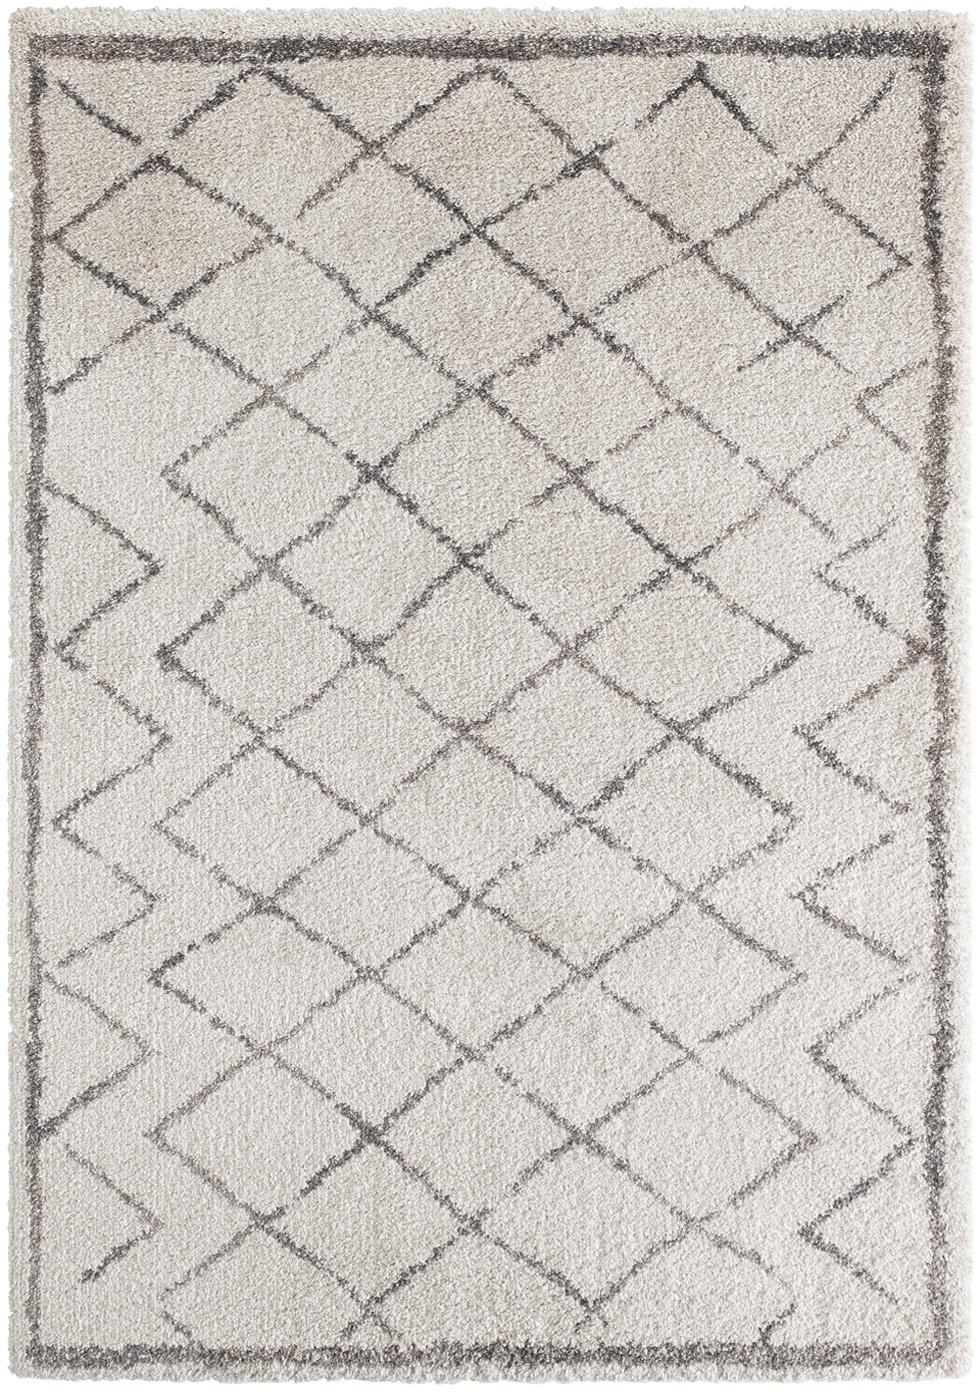 Hochflor-Teppich Grace Diamond mit Rautenmuster, Grau/Creme, Flor: 100% Polypropylen, Creme, Grau, B 120 x L 170 cm (Größe S)